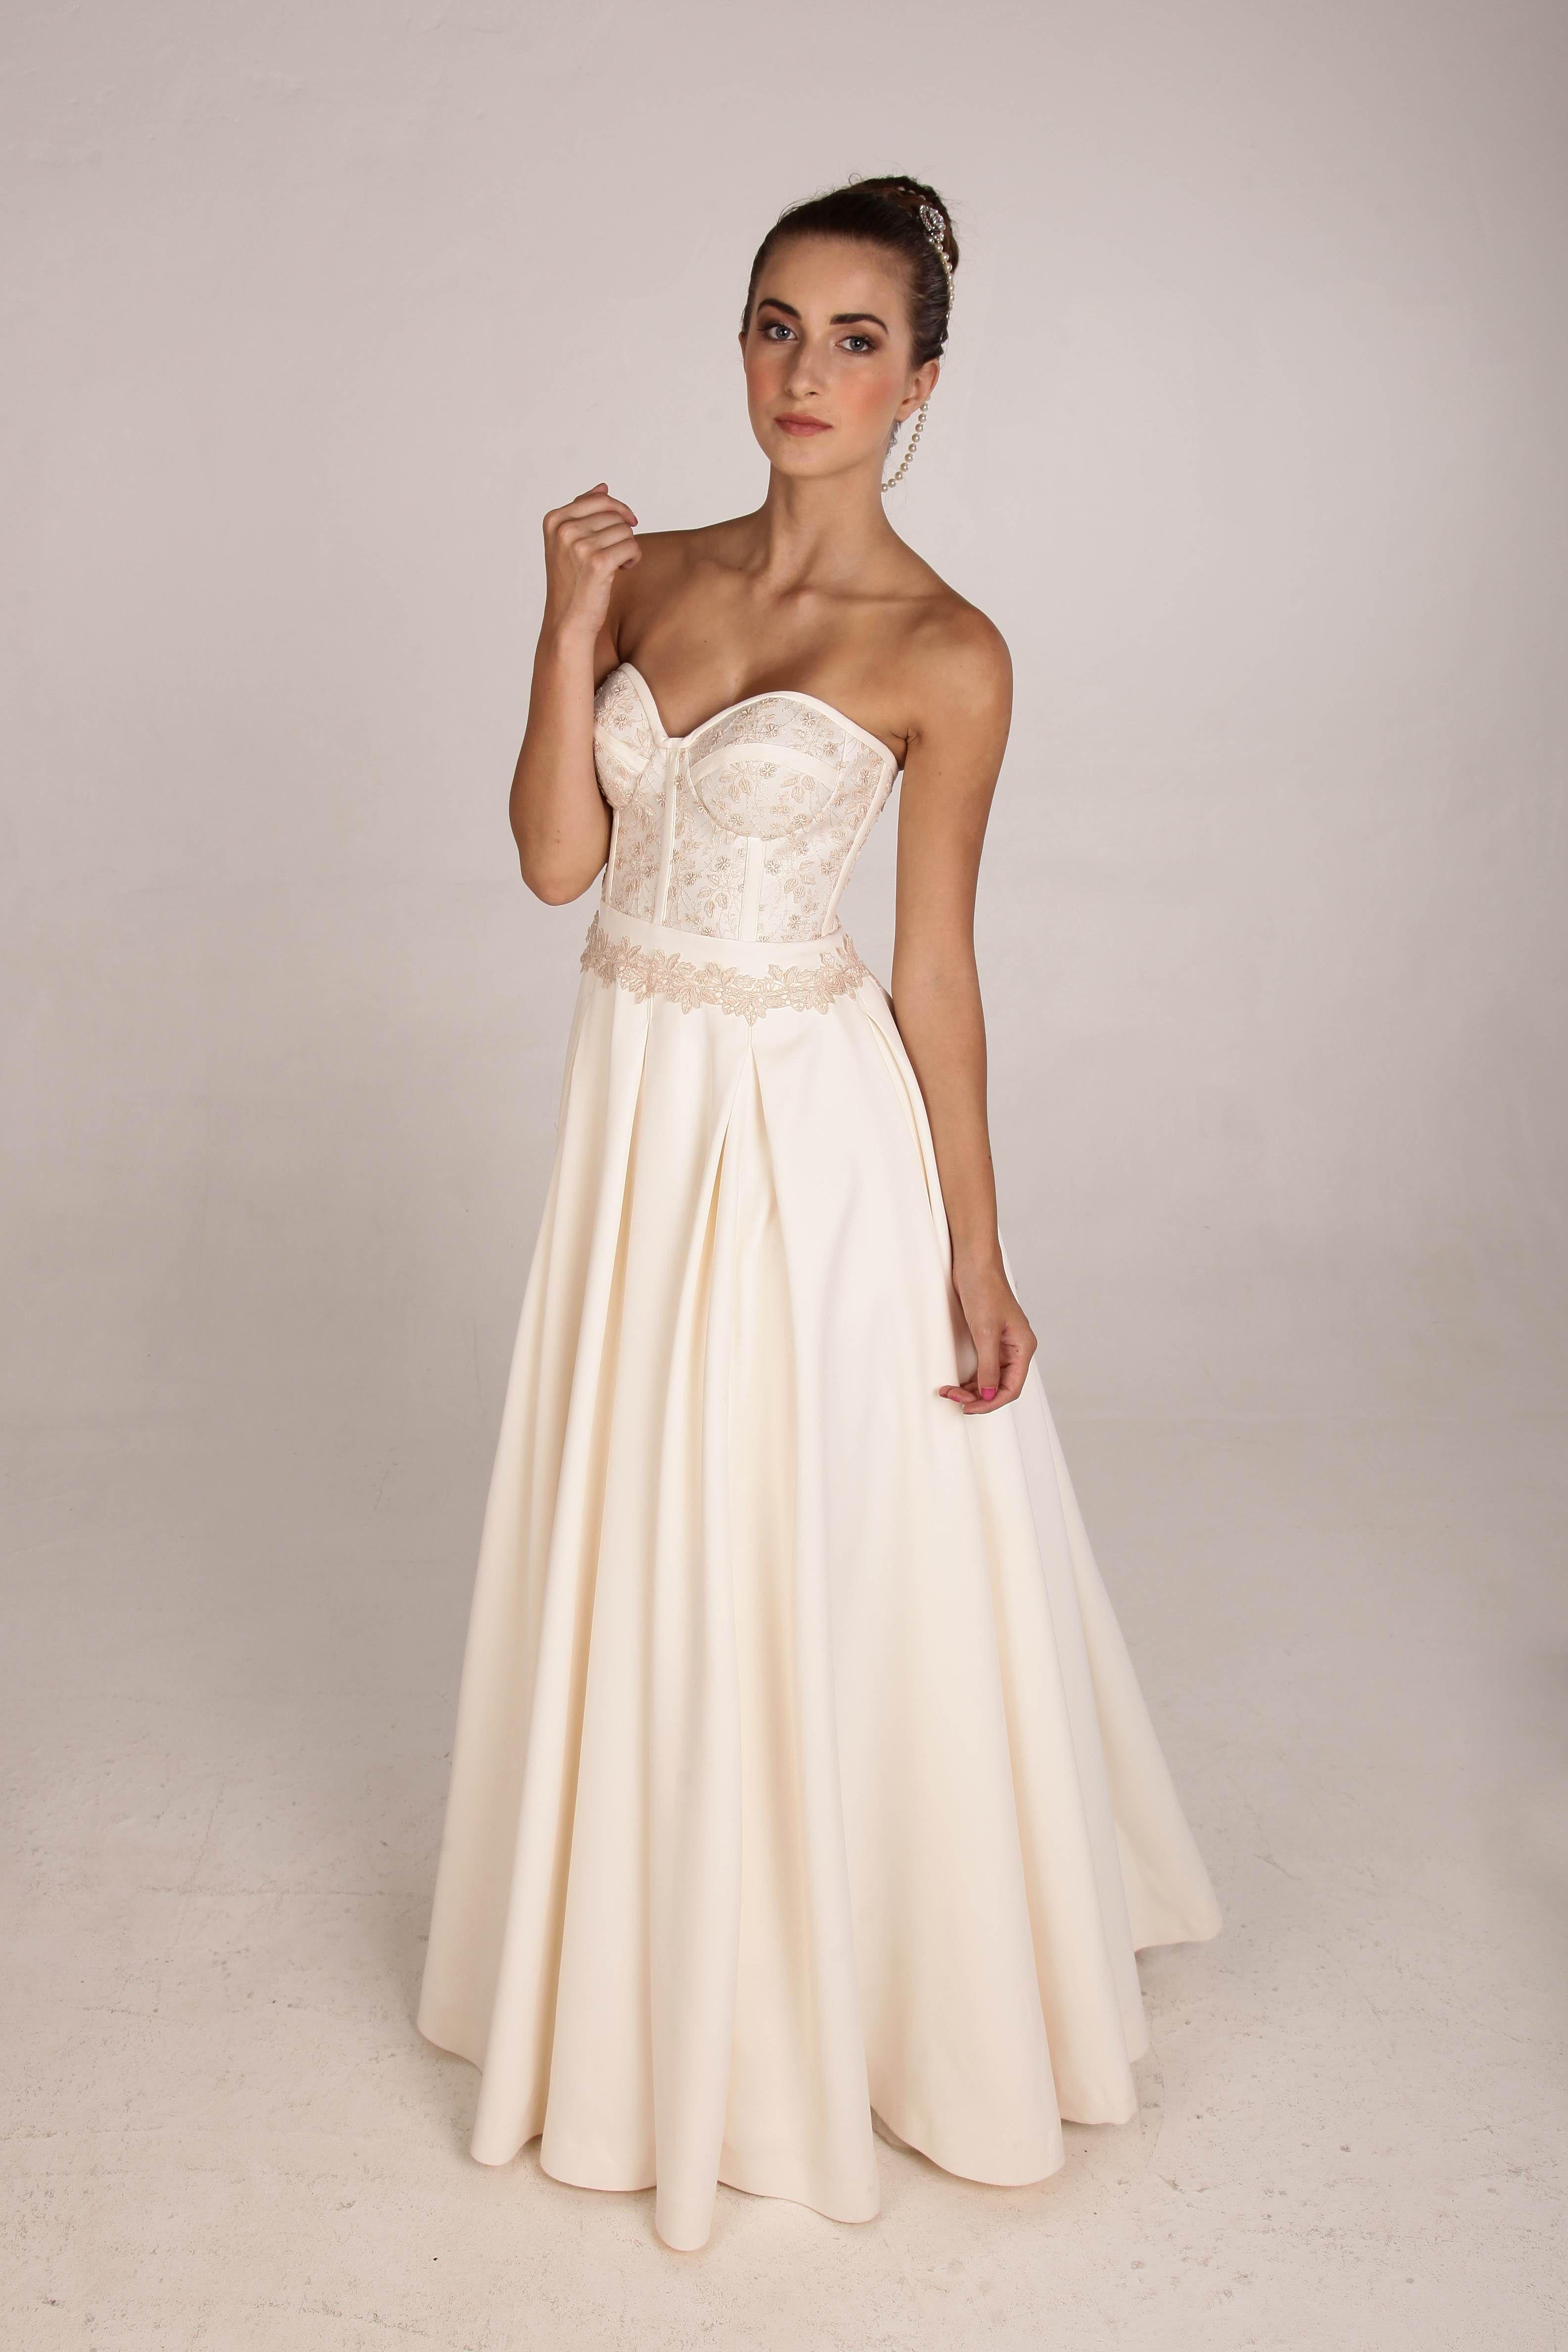 Estelle Bridal Collection Visit The Facebook Page Https Www Facebook Com Estellevisserdesigns Bridal Collection Strapless Wedding Dress Bridal